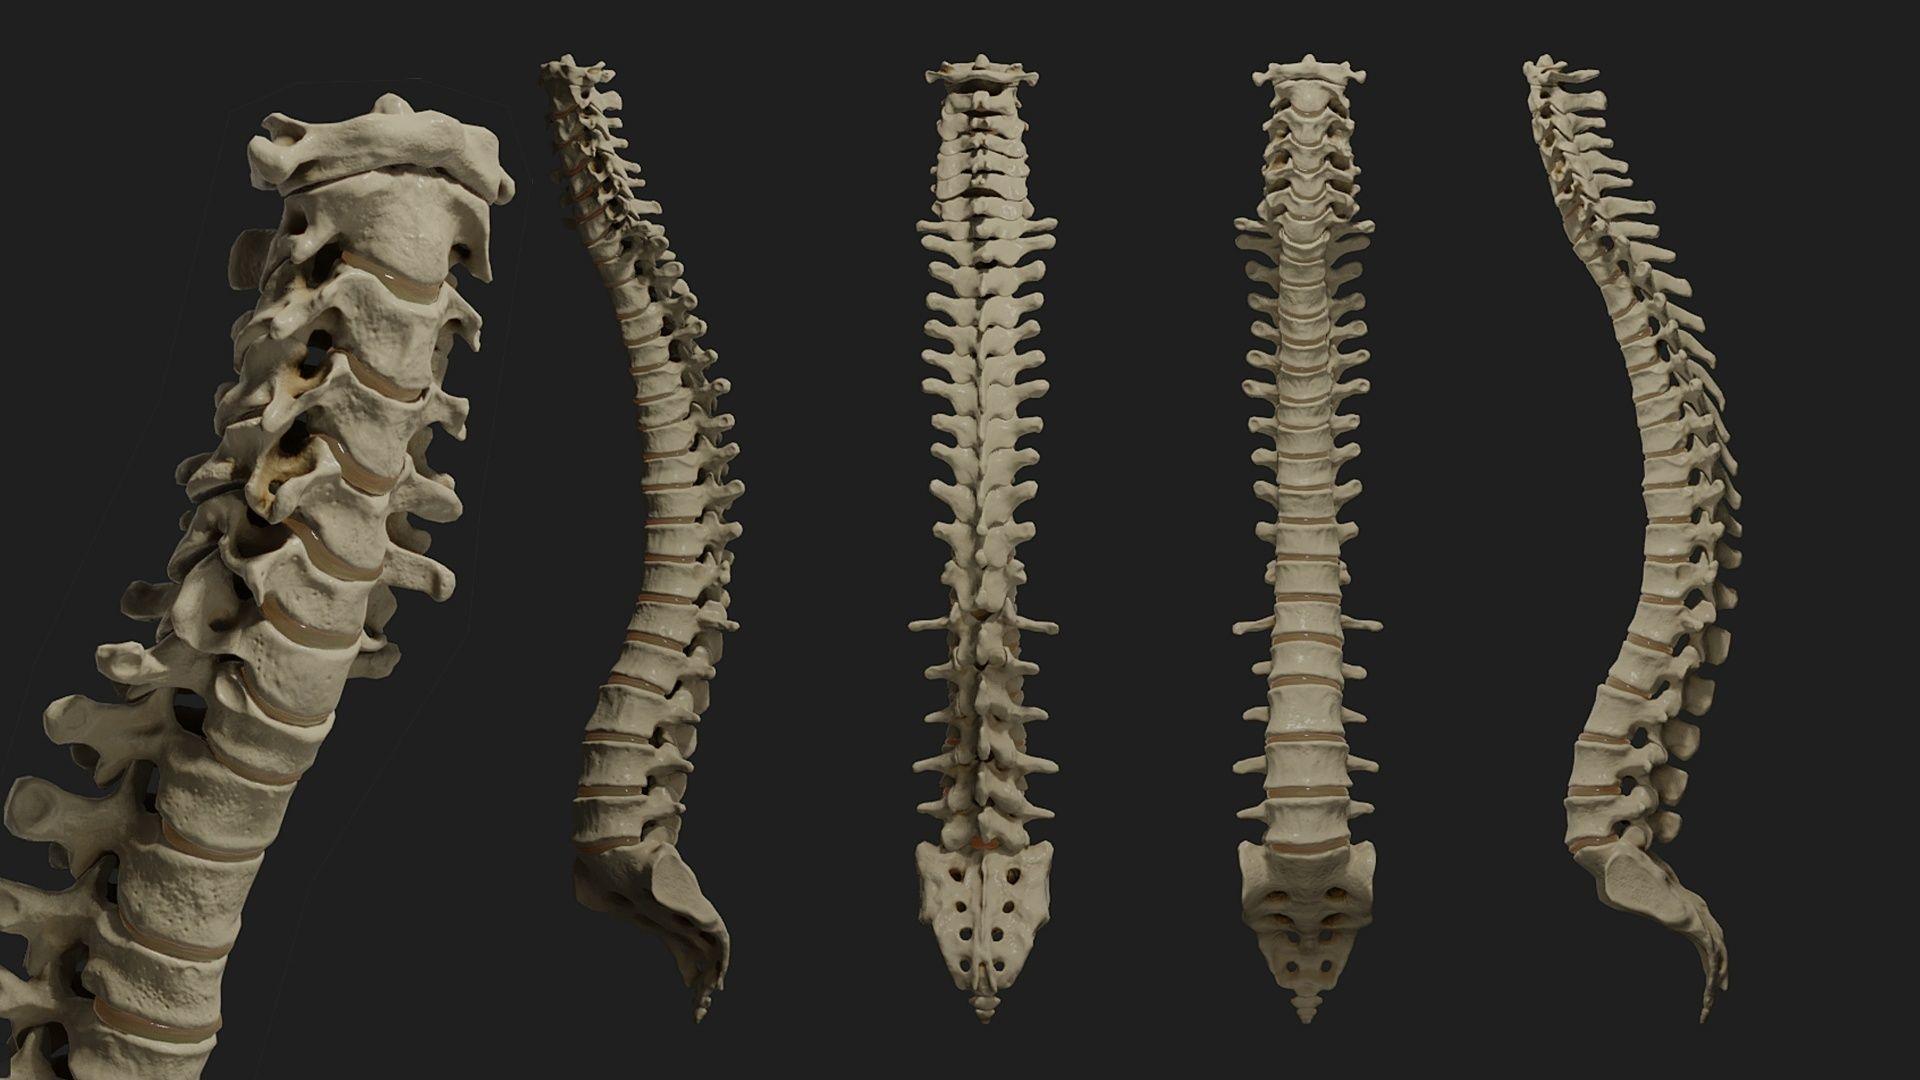 Human spine PBR